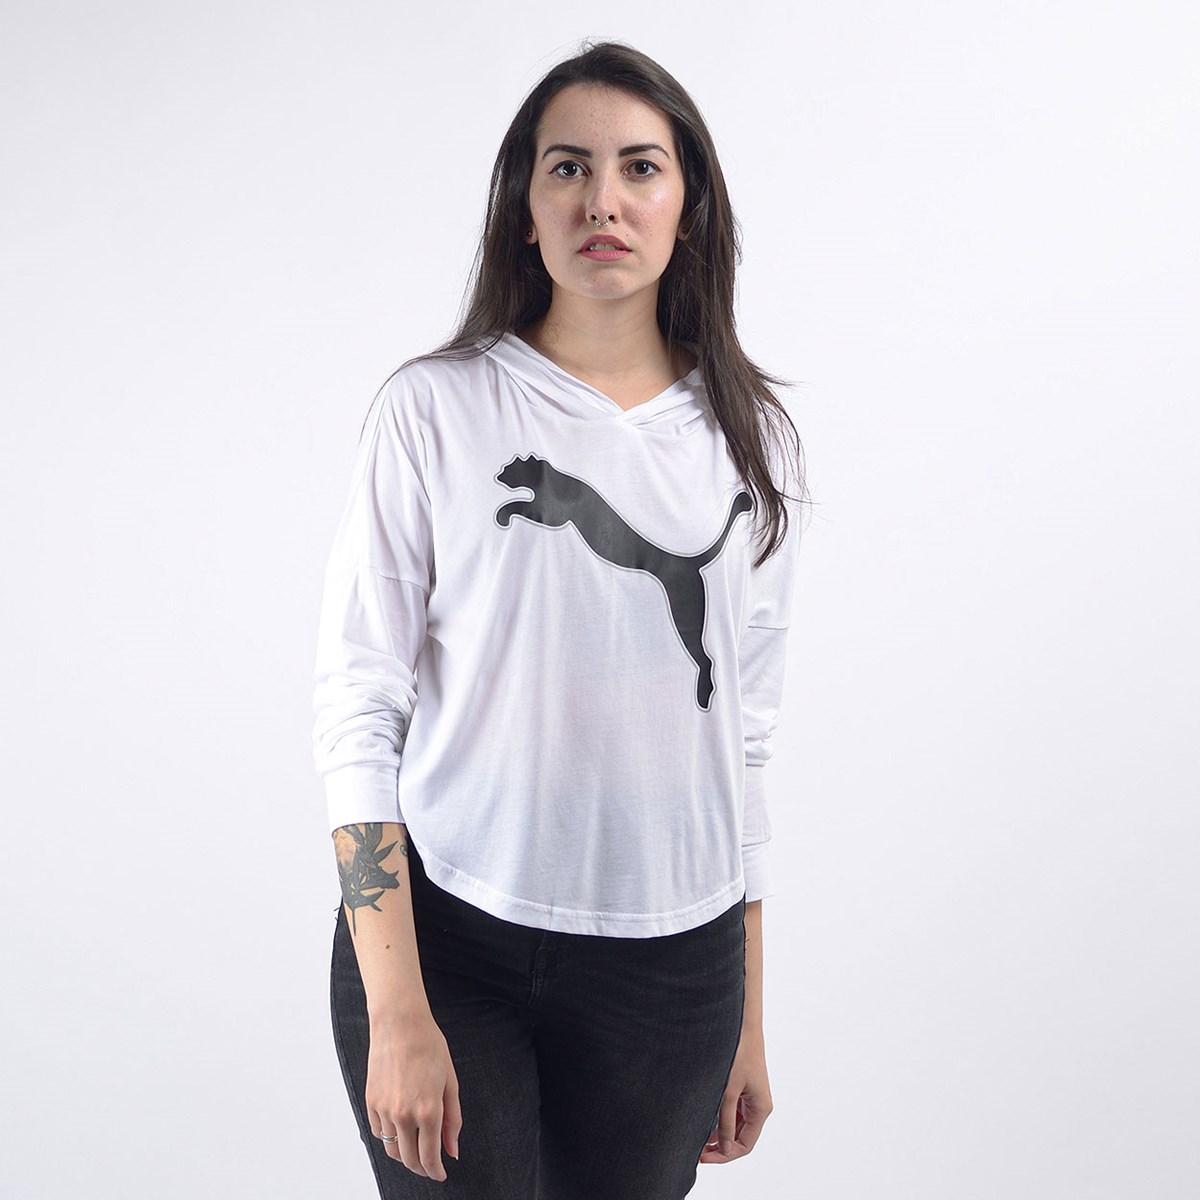 Camiseta Puma Feminina Capuz Modern Sports Cover Up White 58123302